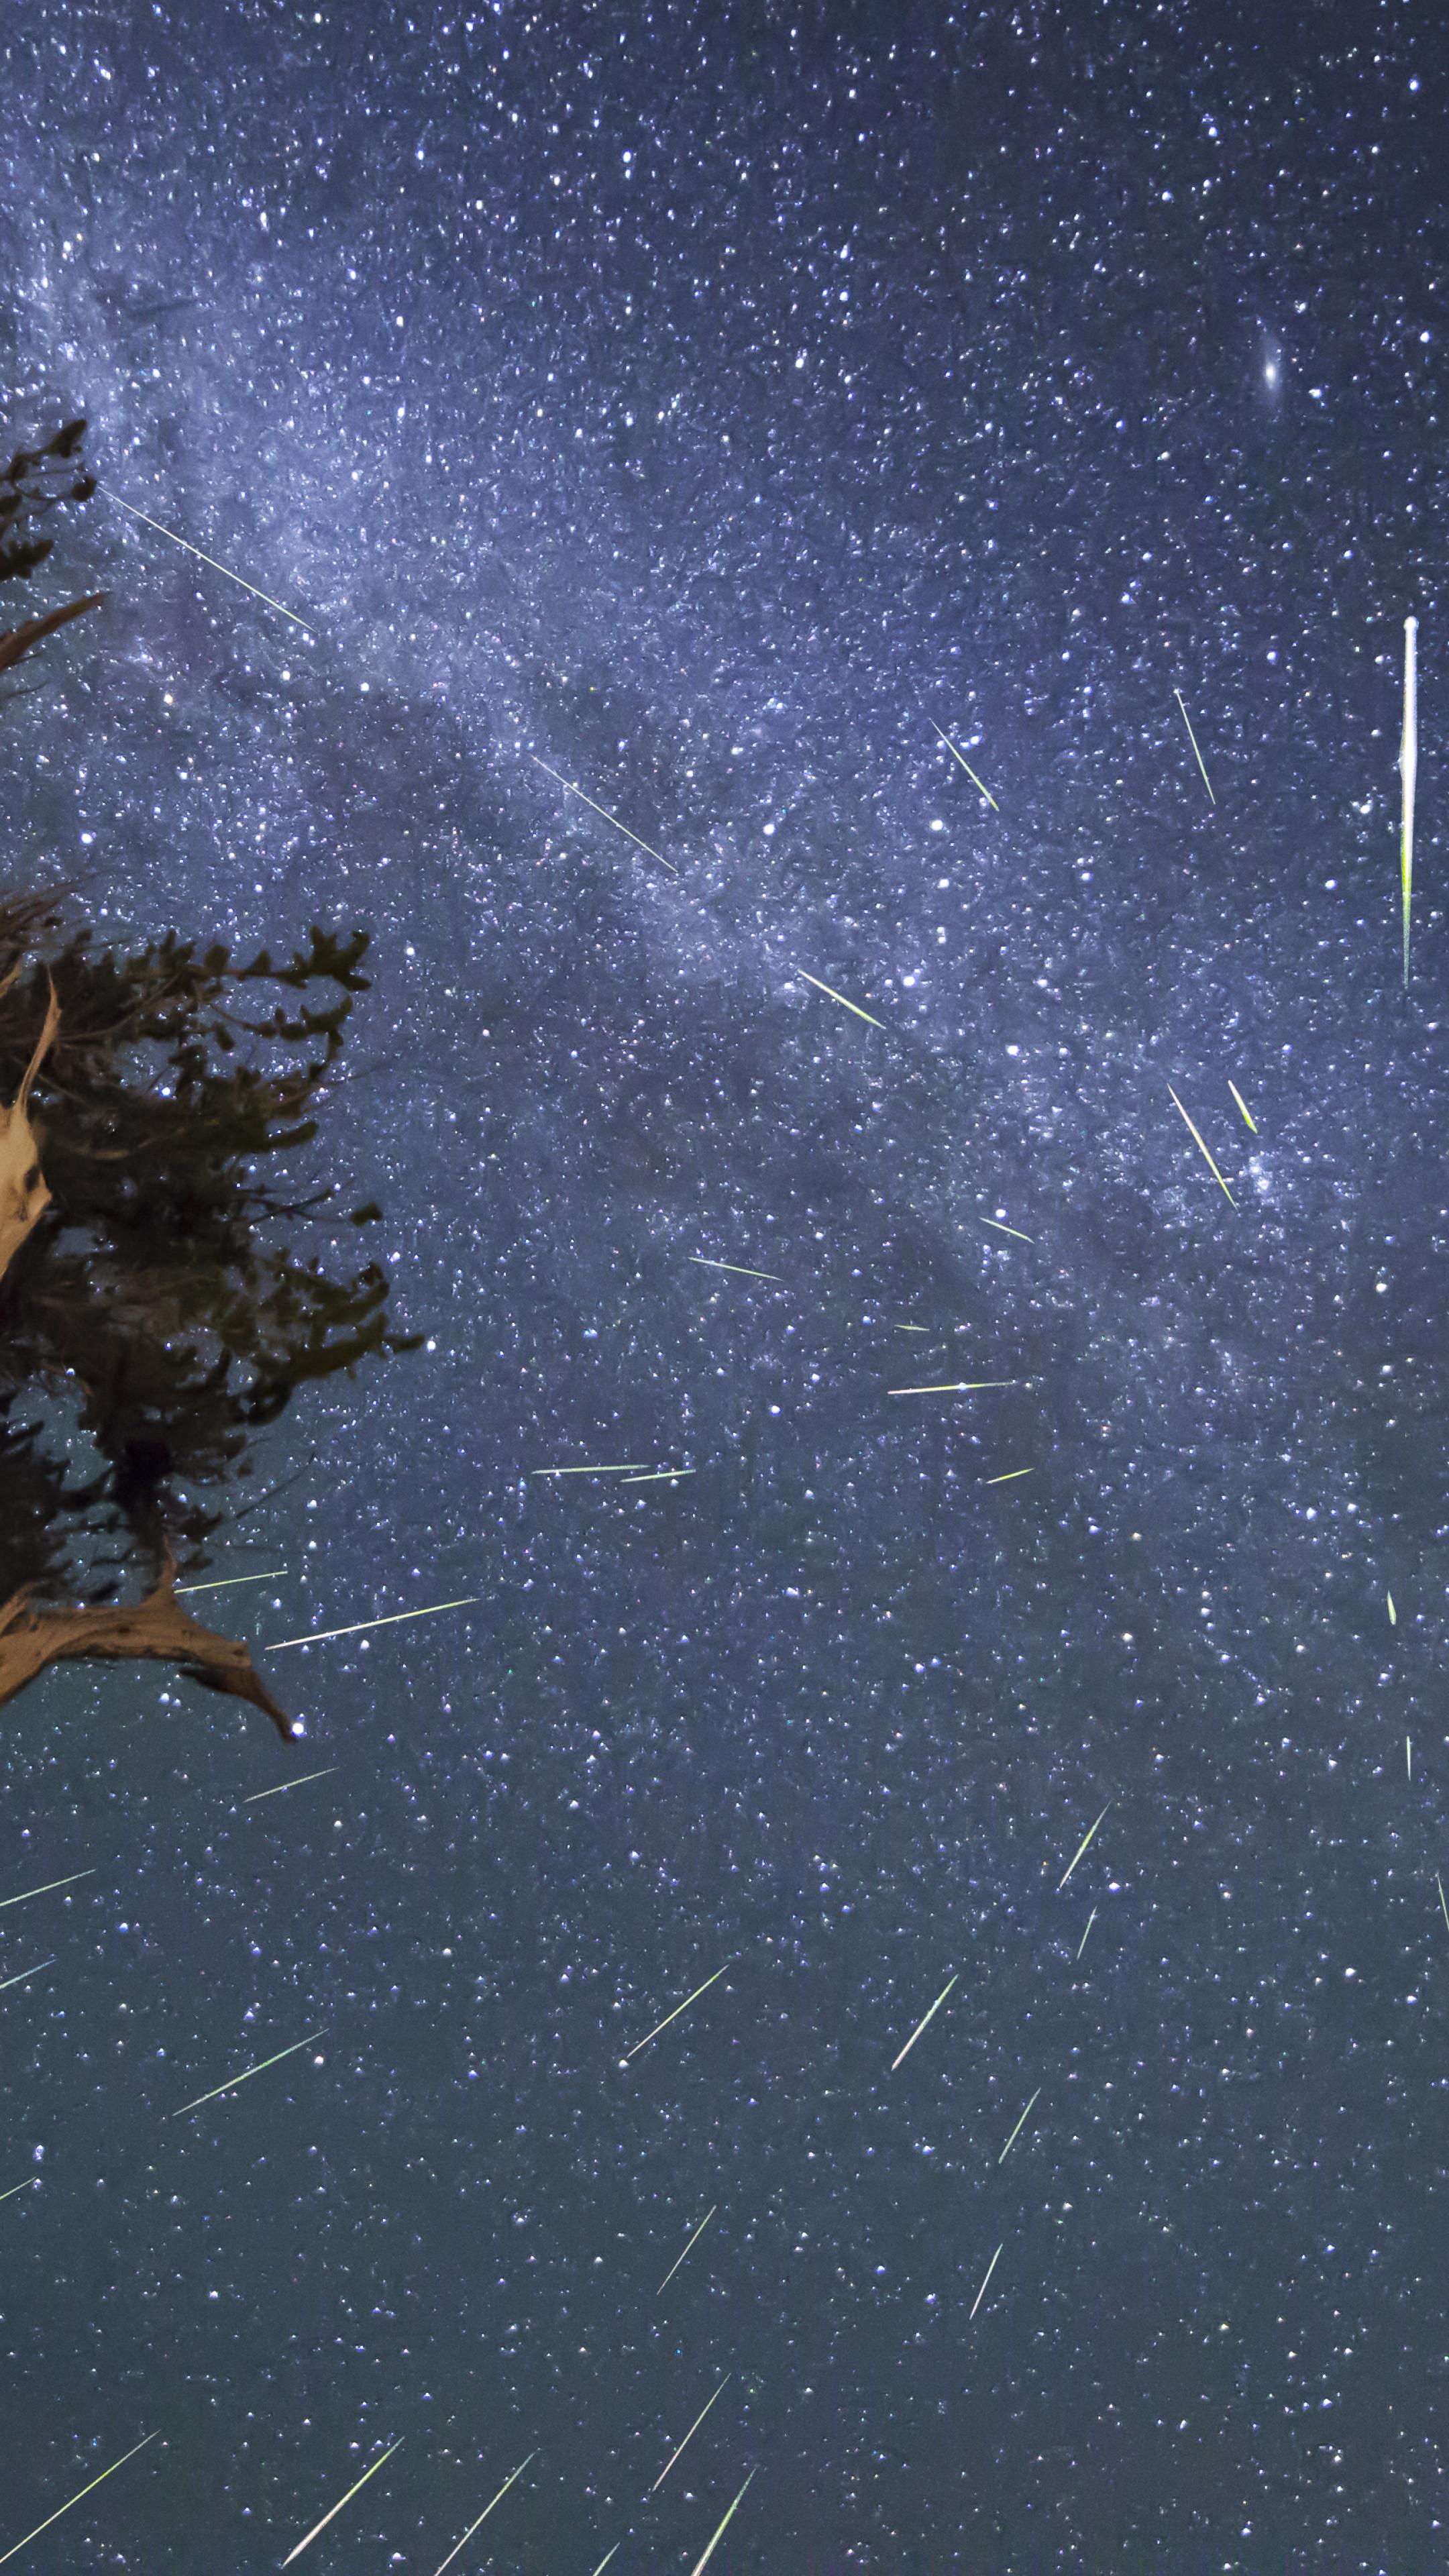 Meteor Shower Wallpaper ·①  Meteor Shower W...